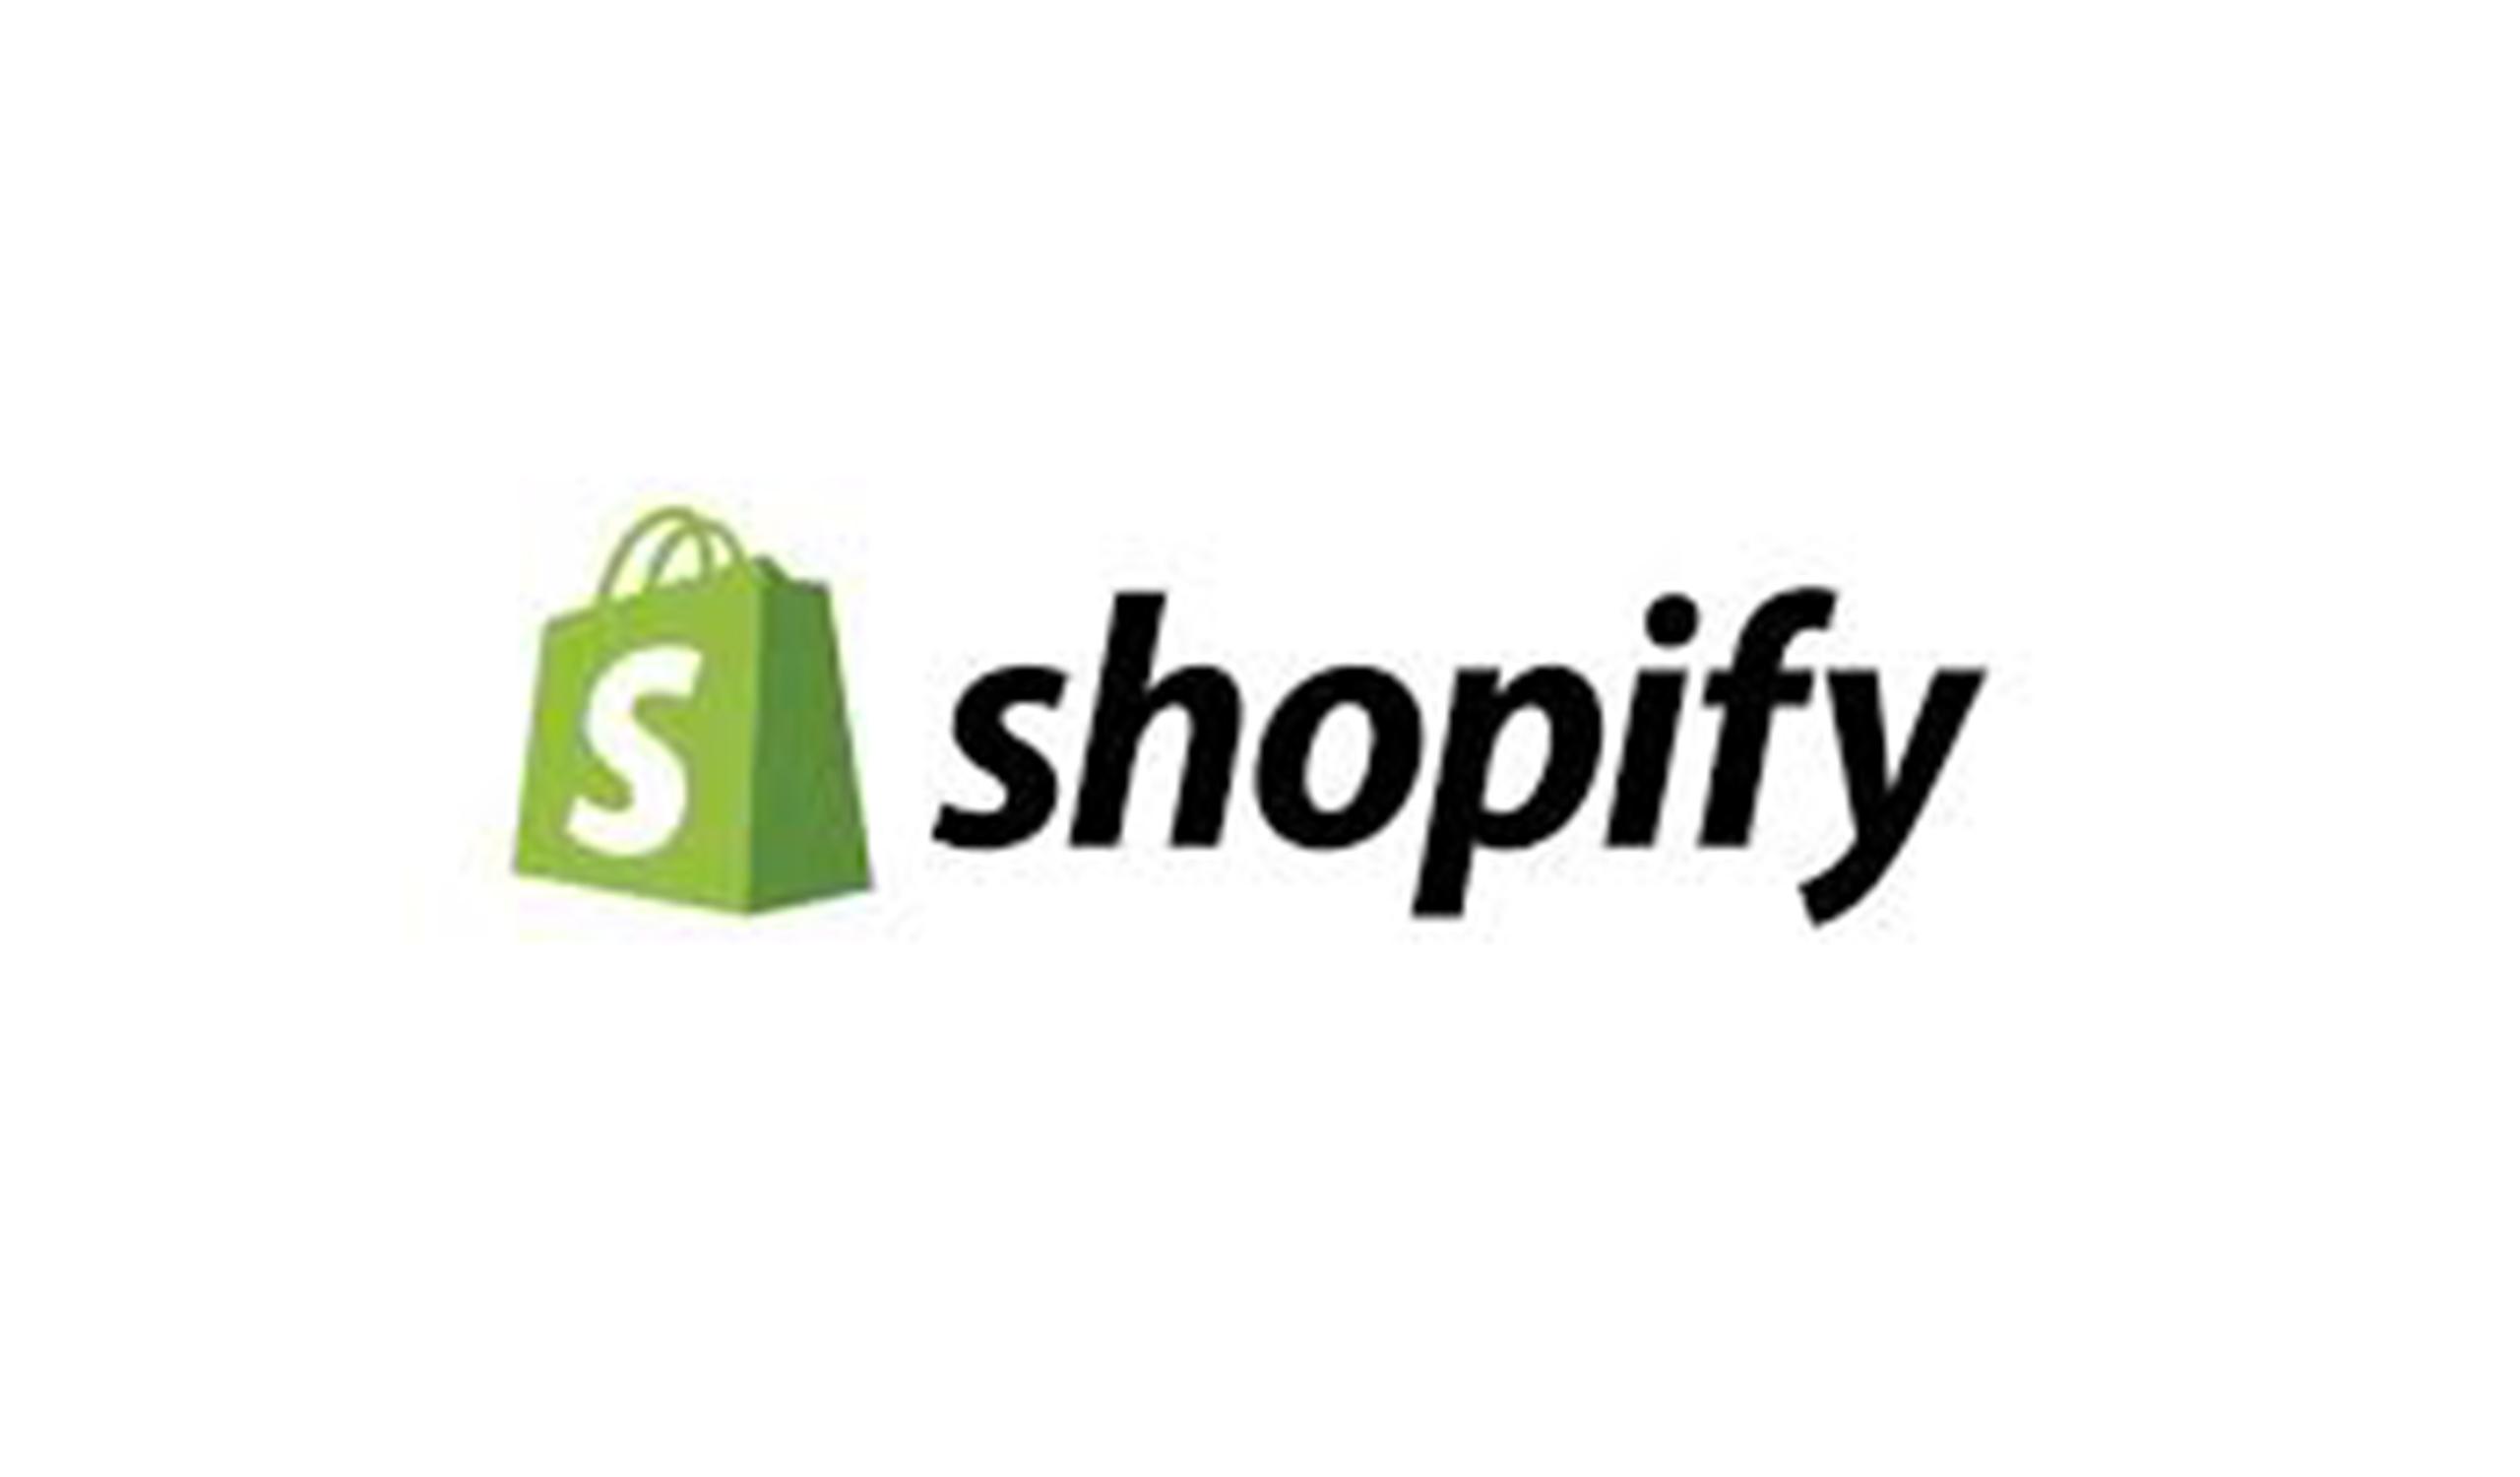 cuckhoo-web-design-digital-marketing-industry-skills-shopify